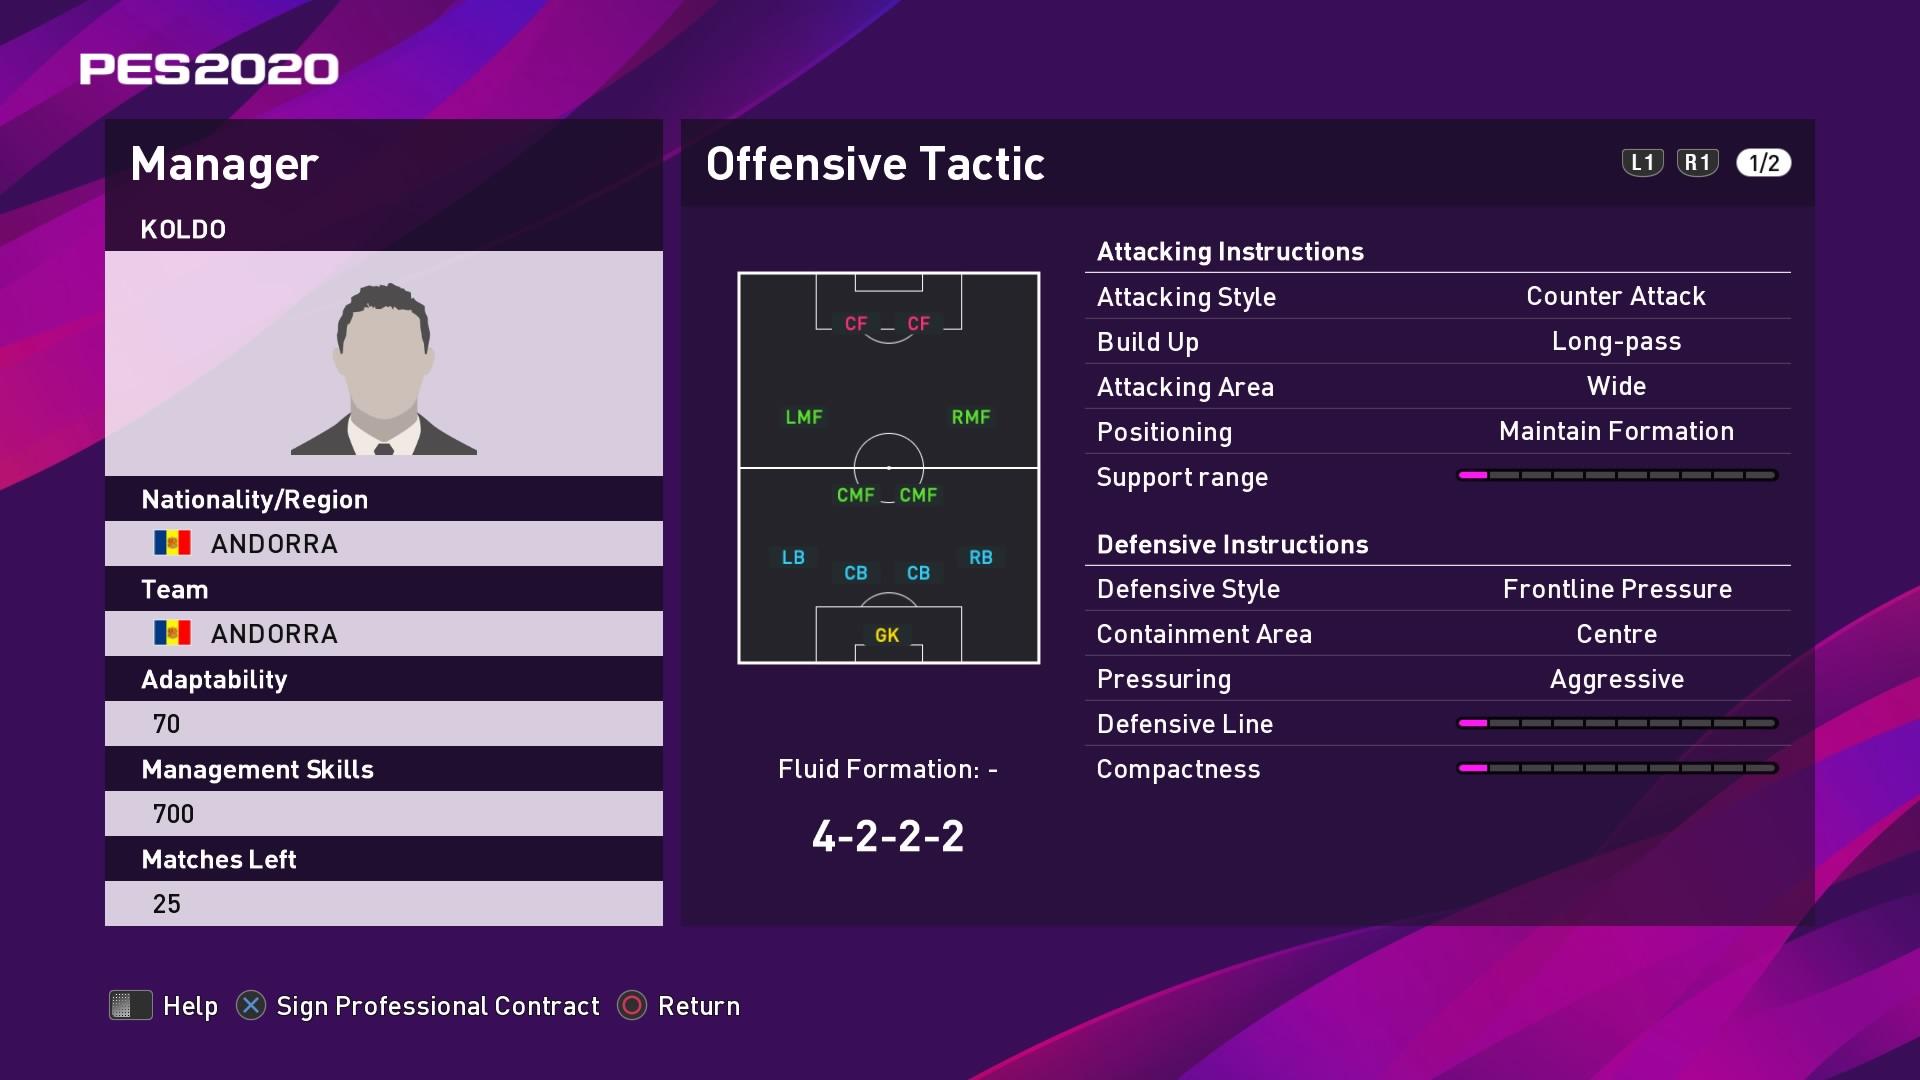 Koldo (Koldo Álvarez) Offensive Tactic in PES 2020 myClub